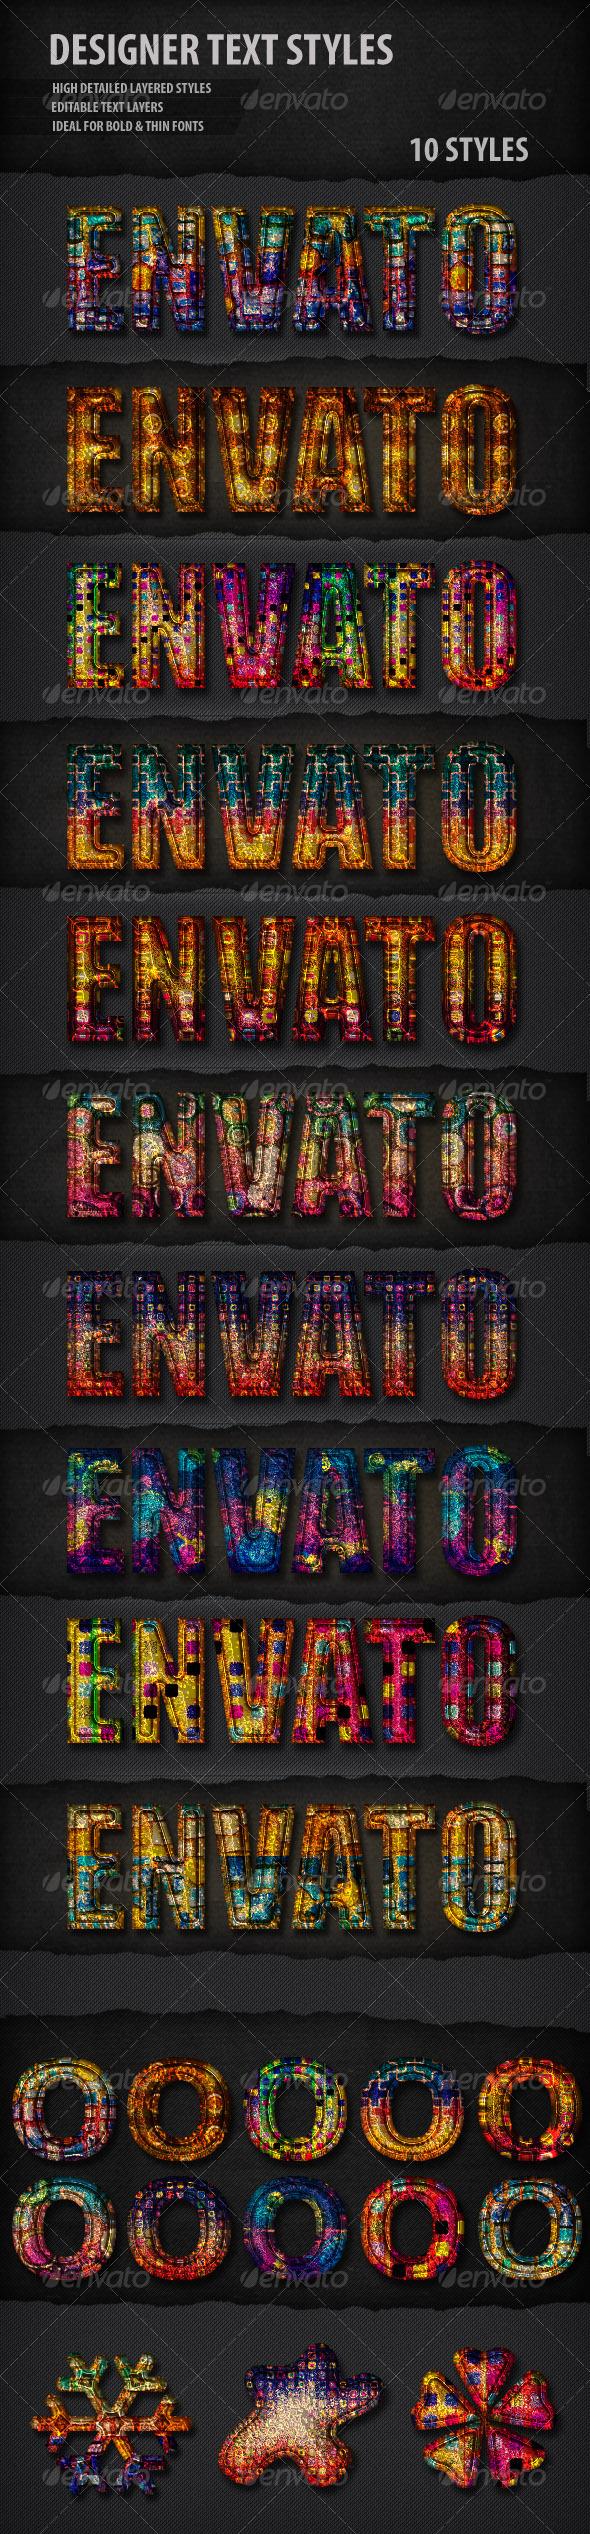 GraphicRiver Designer Text Styles 4528025